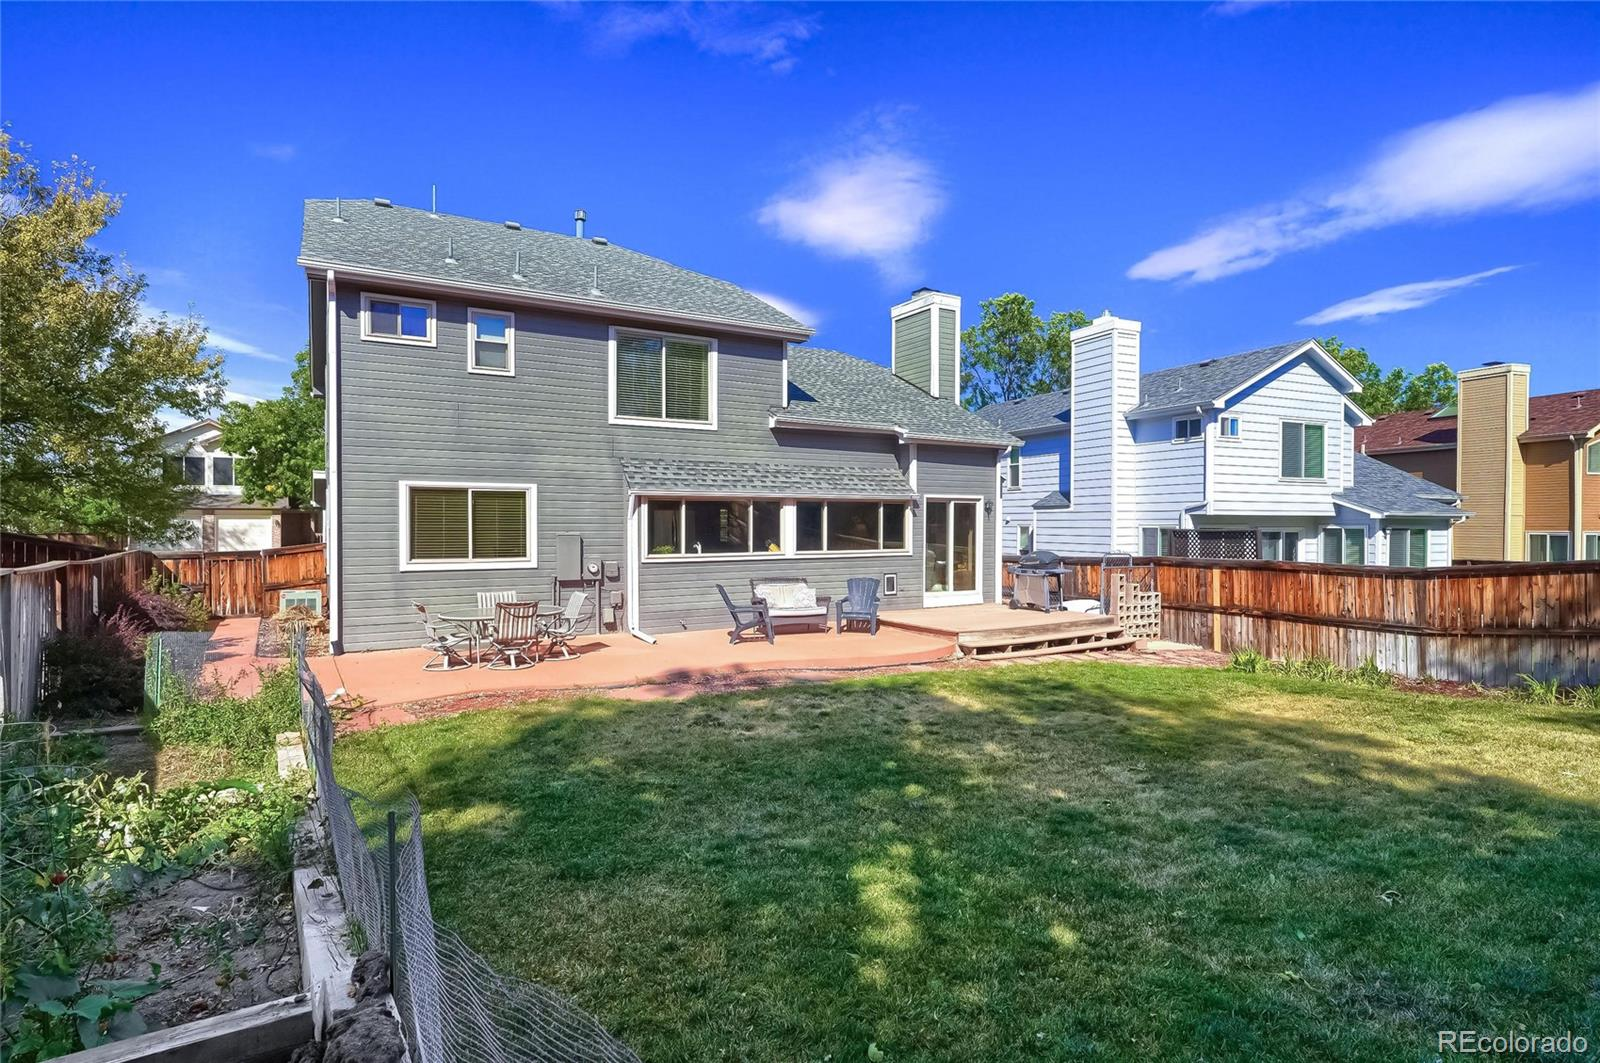 9490 Sherrelwood, Highlands Ranch, CO